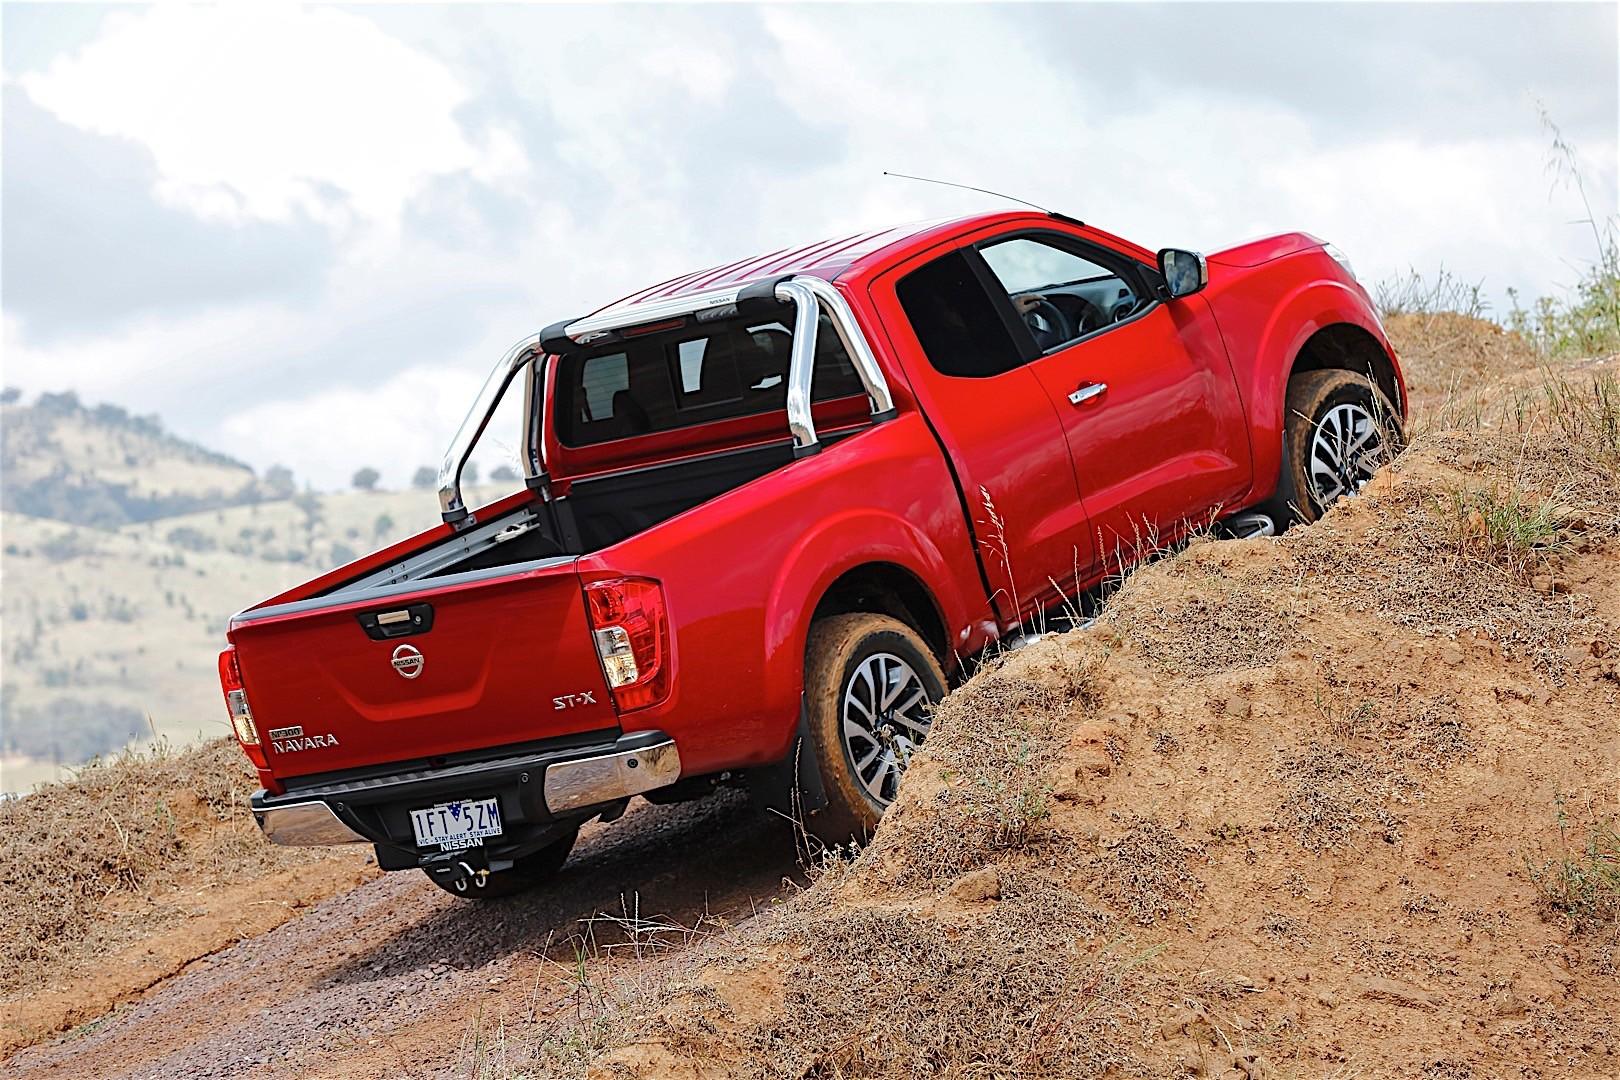 Image Result For Nissan Navara New Release